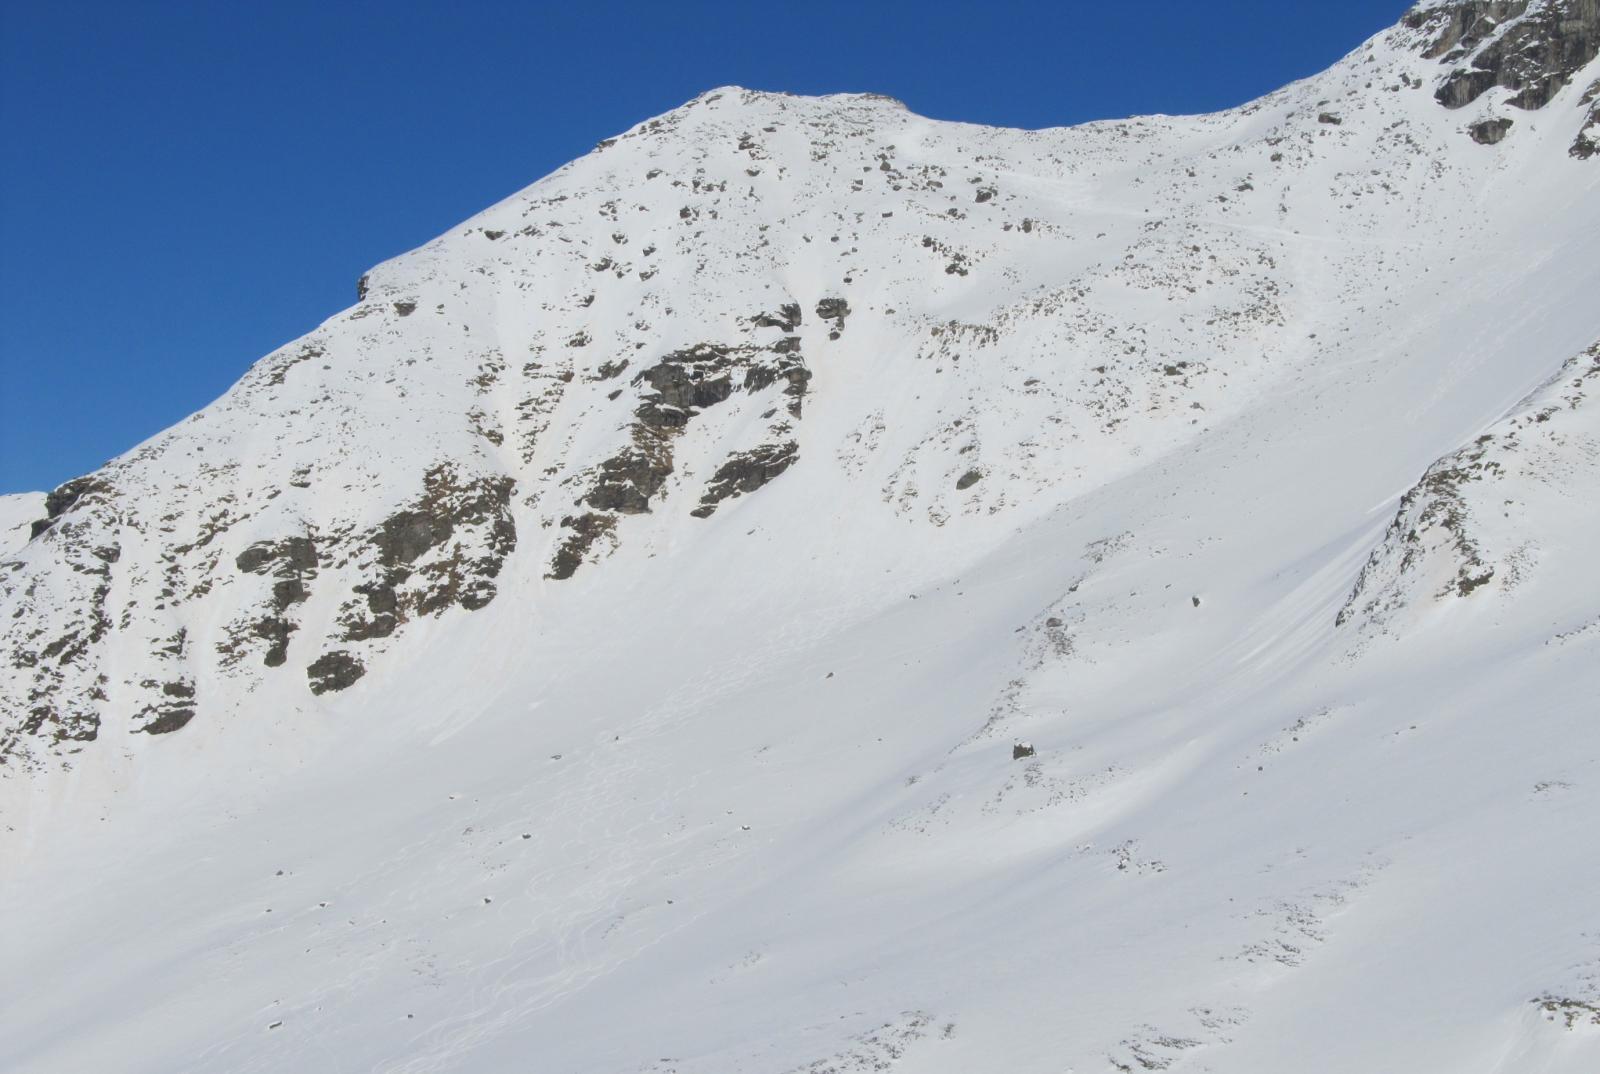 La punta vista dal percorso della Kluppen